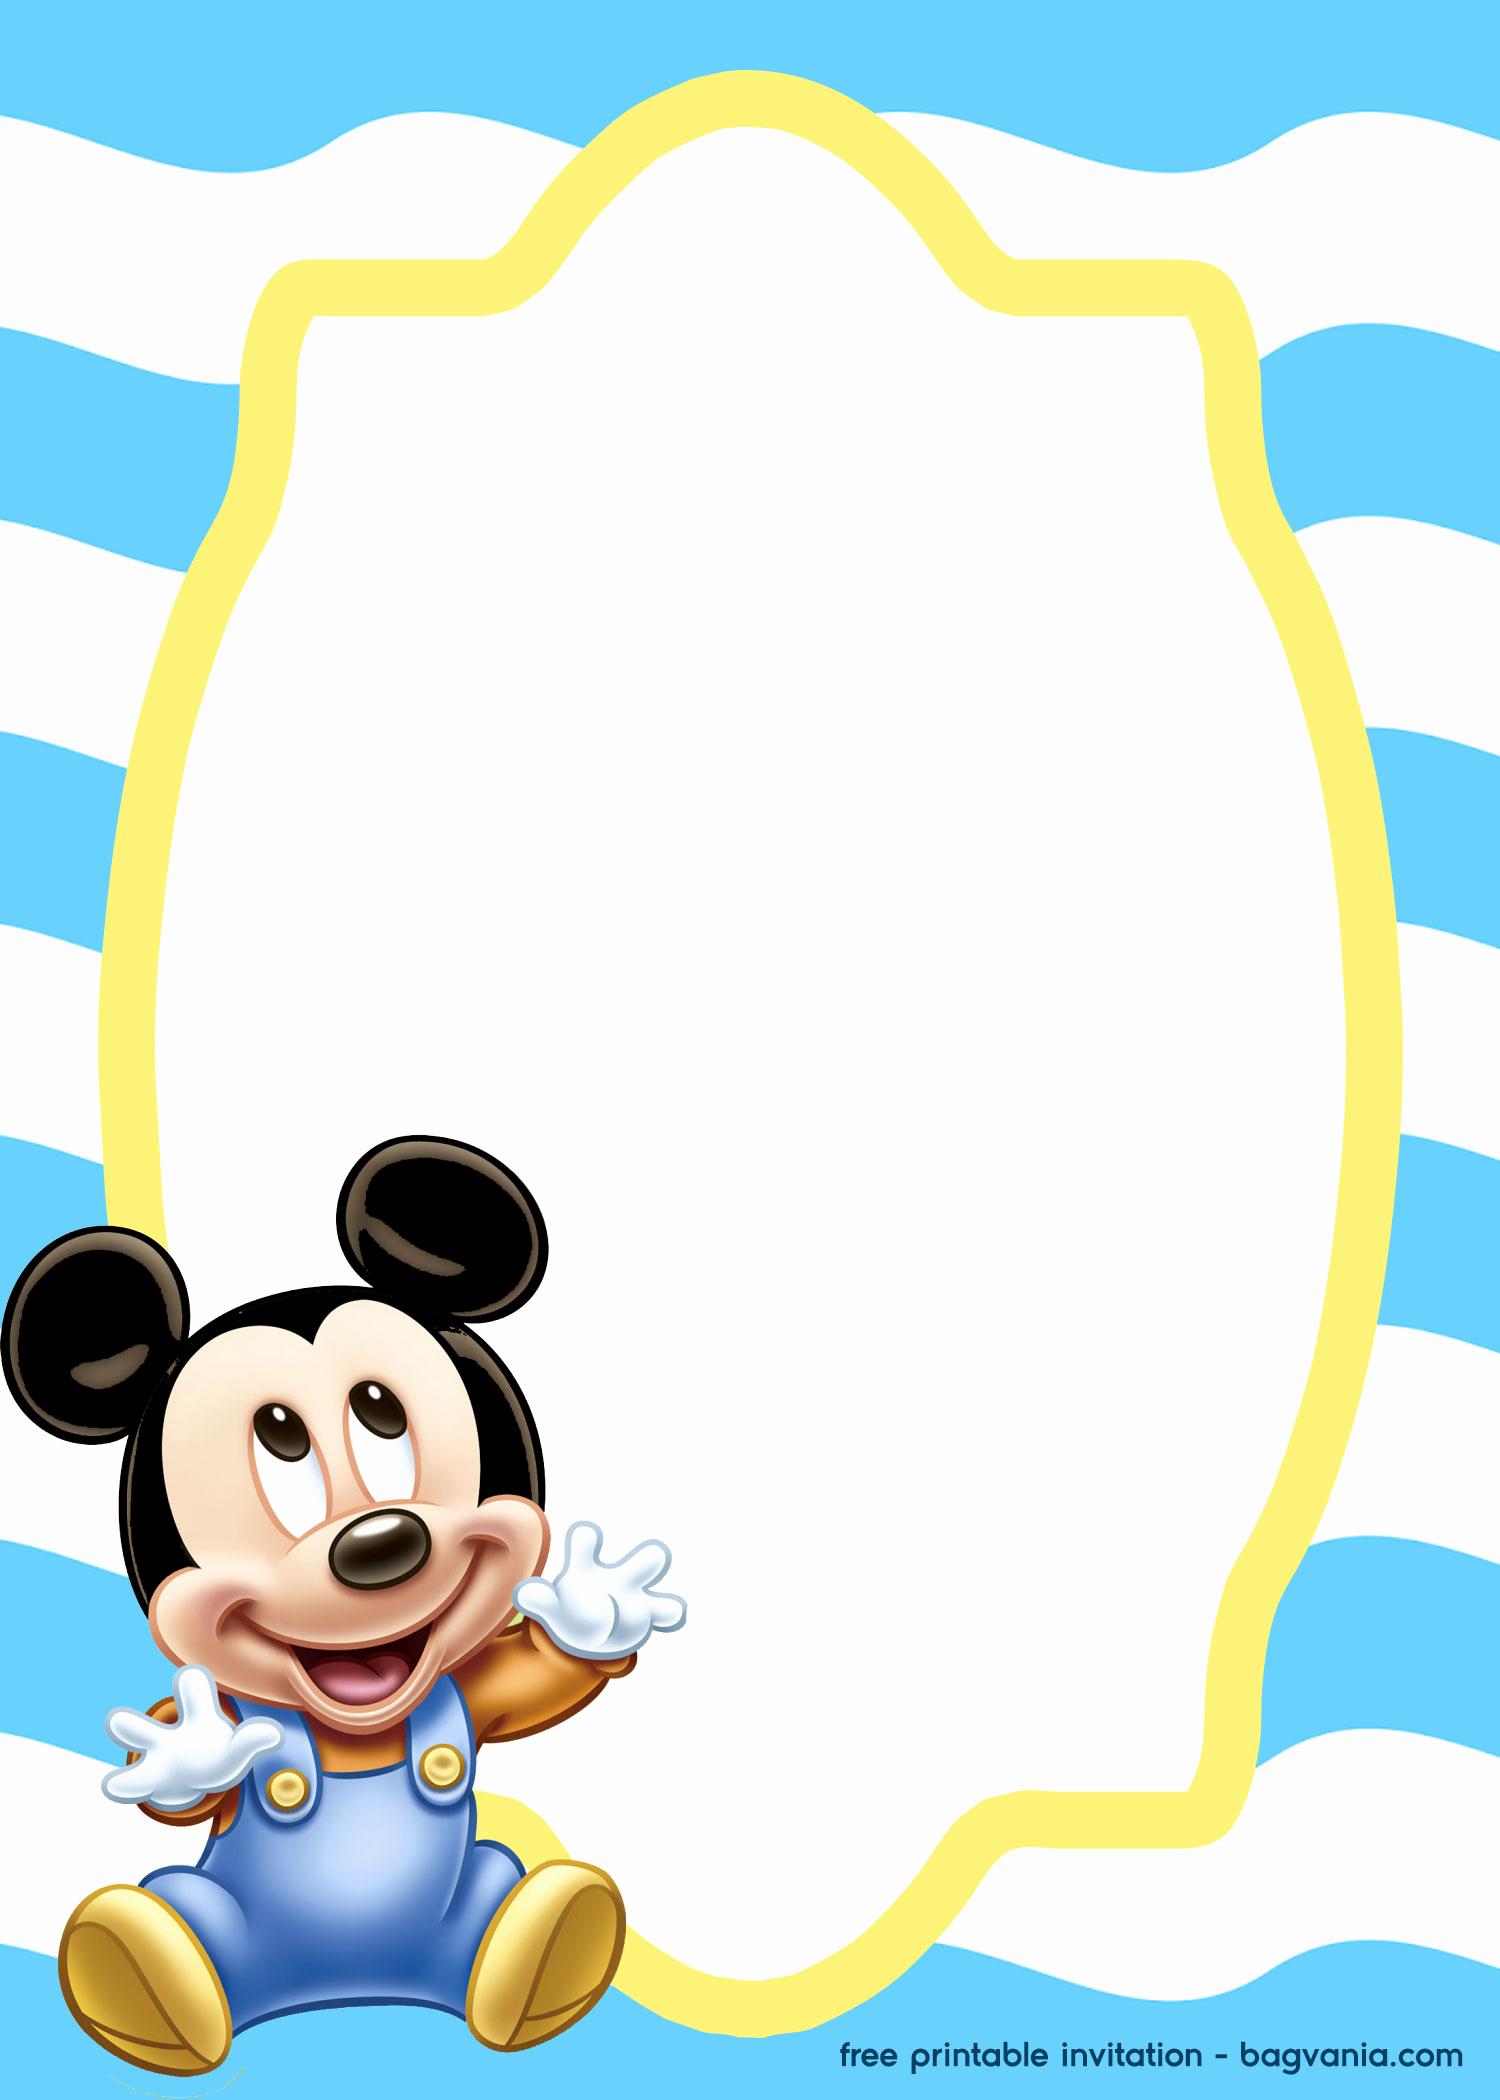 Baby Mickey Invitation Template Inspirational Free Mickey Mouse Baby Invitation Template – Free